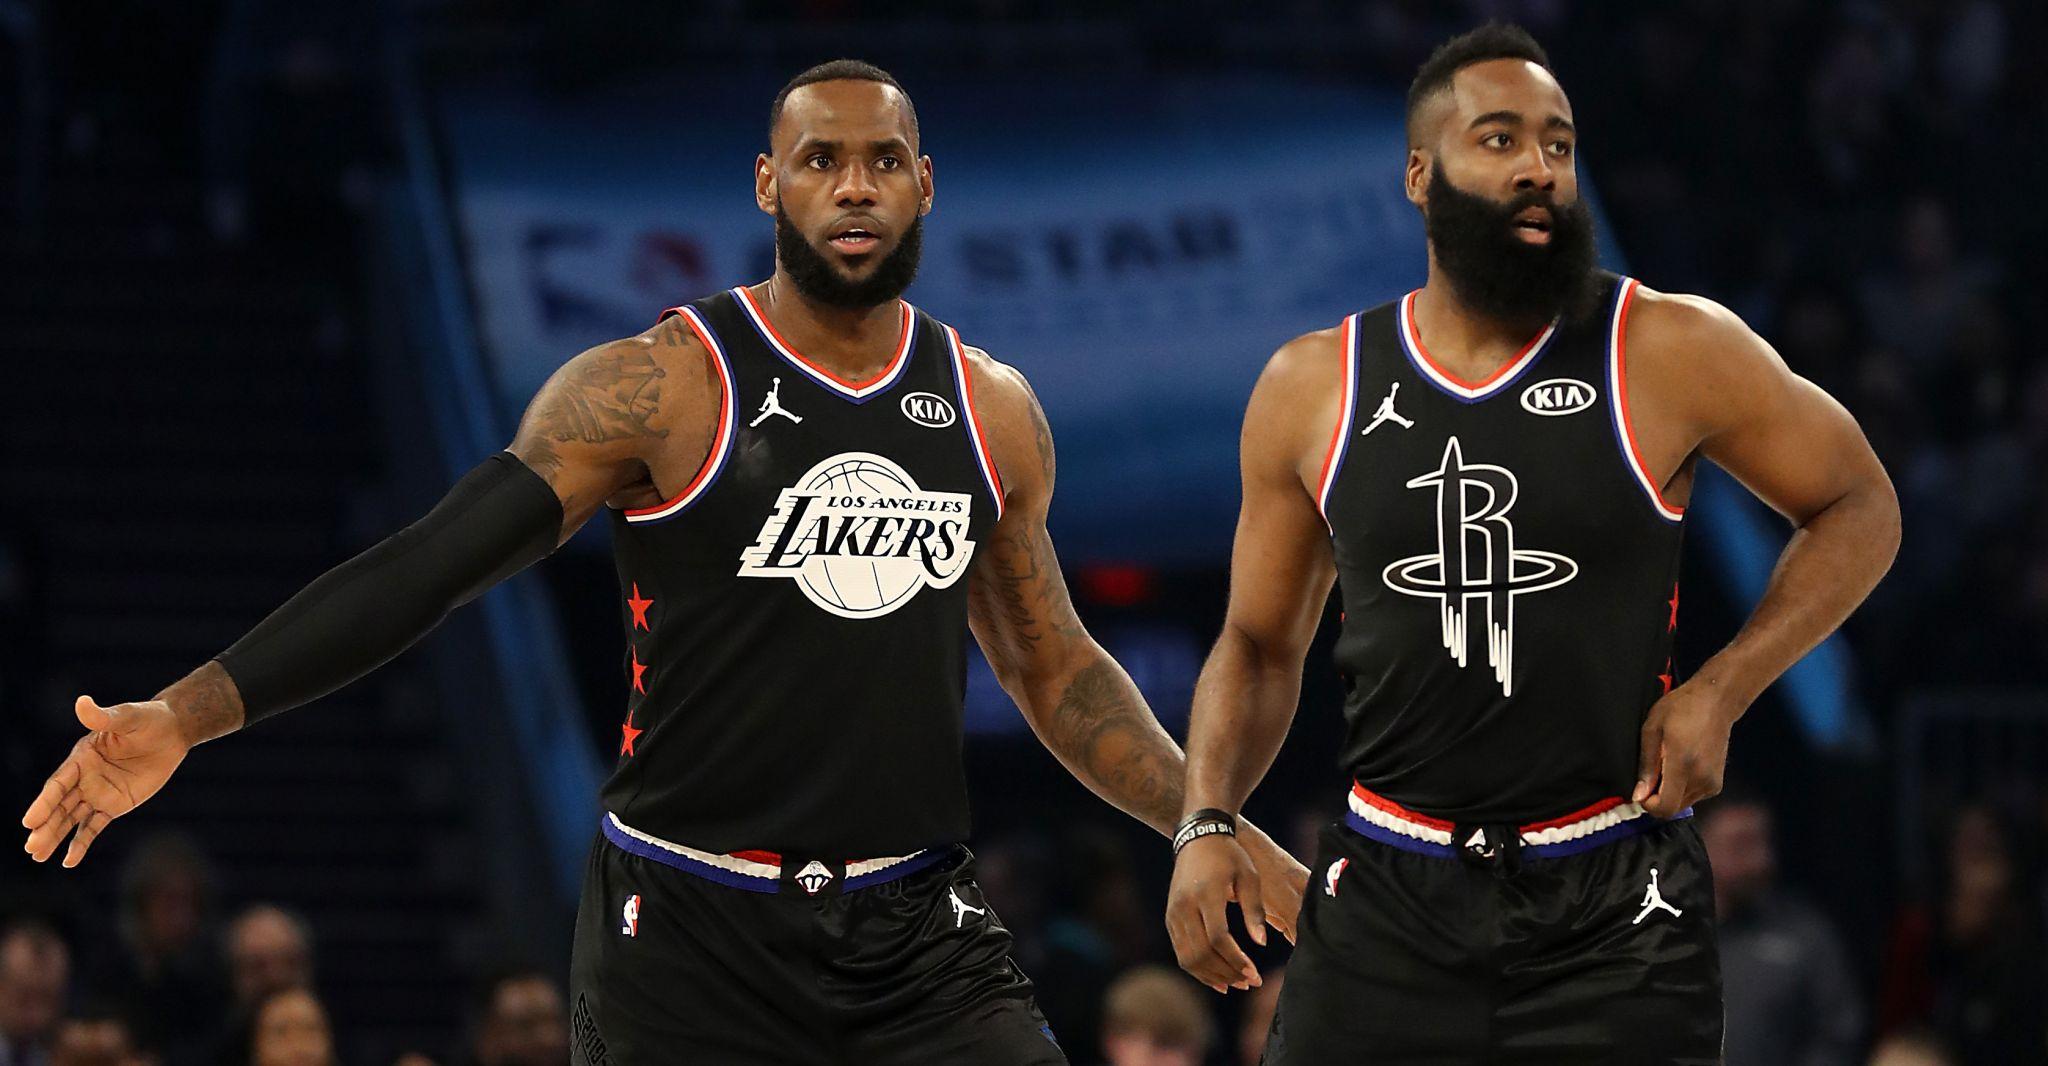 Team LeBron rallies, wins All-Star game 178-164